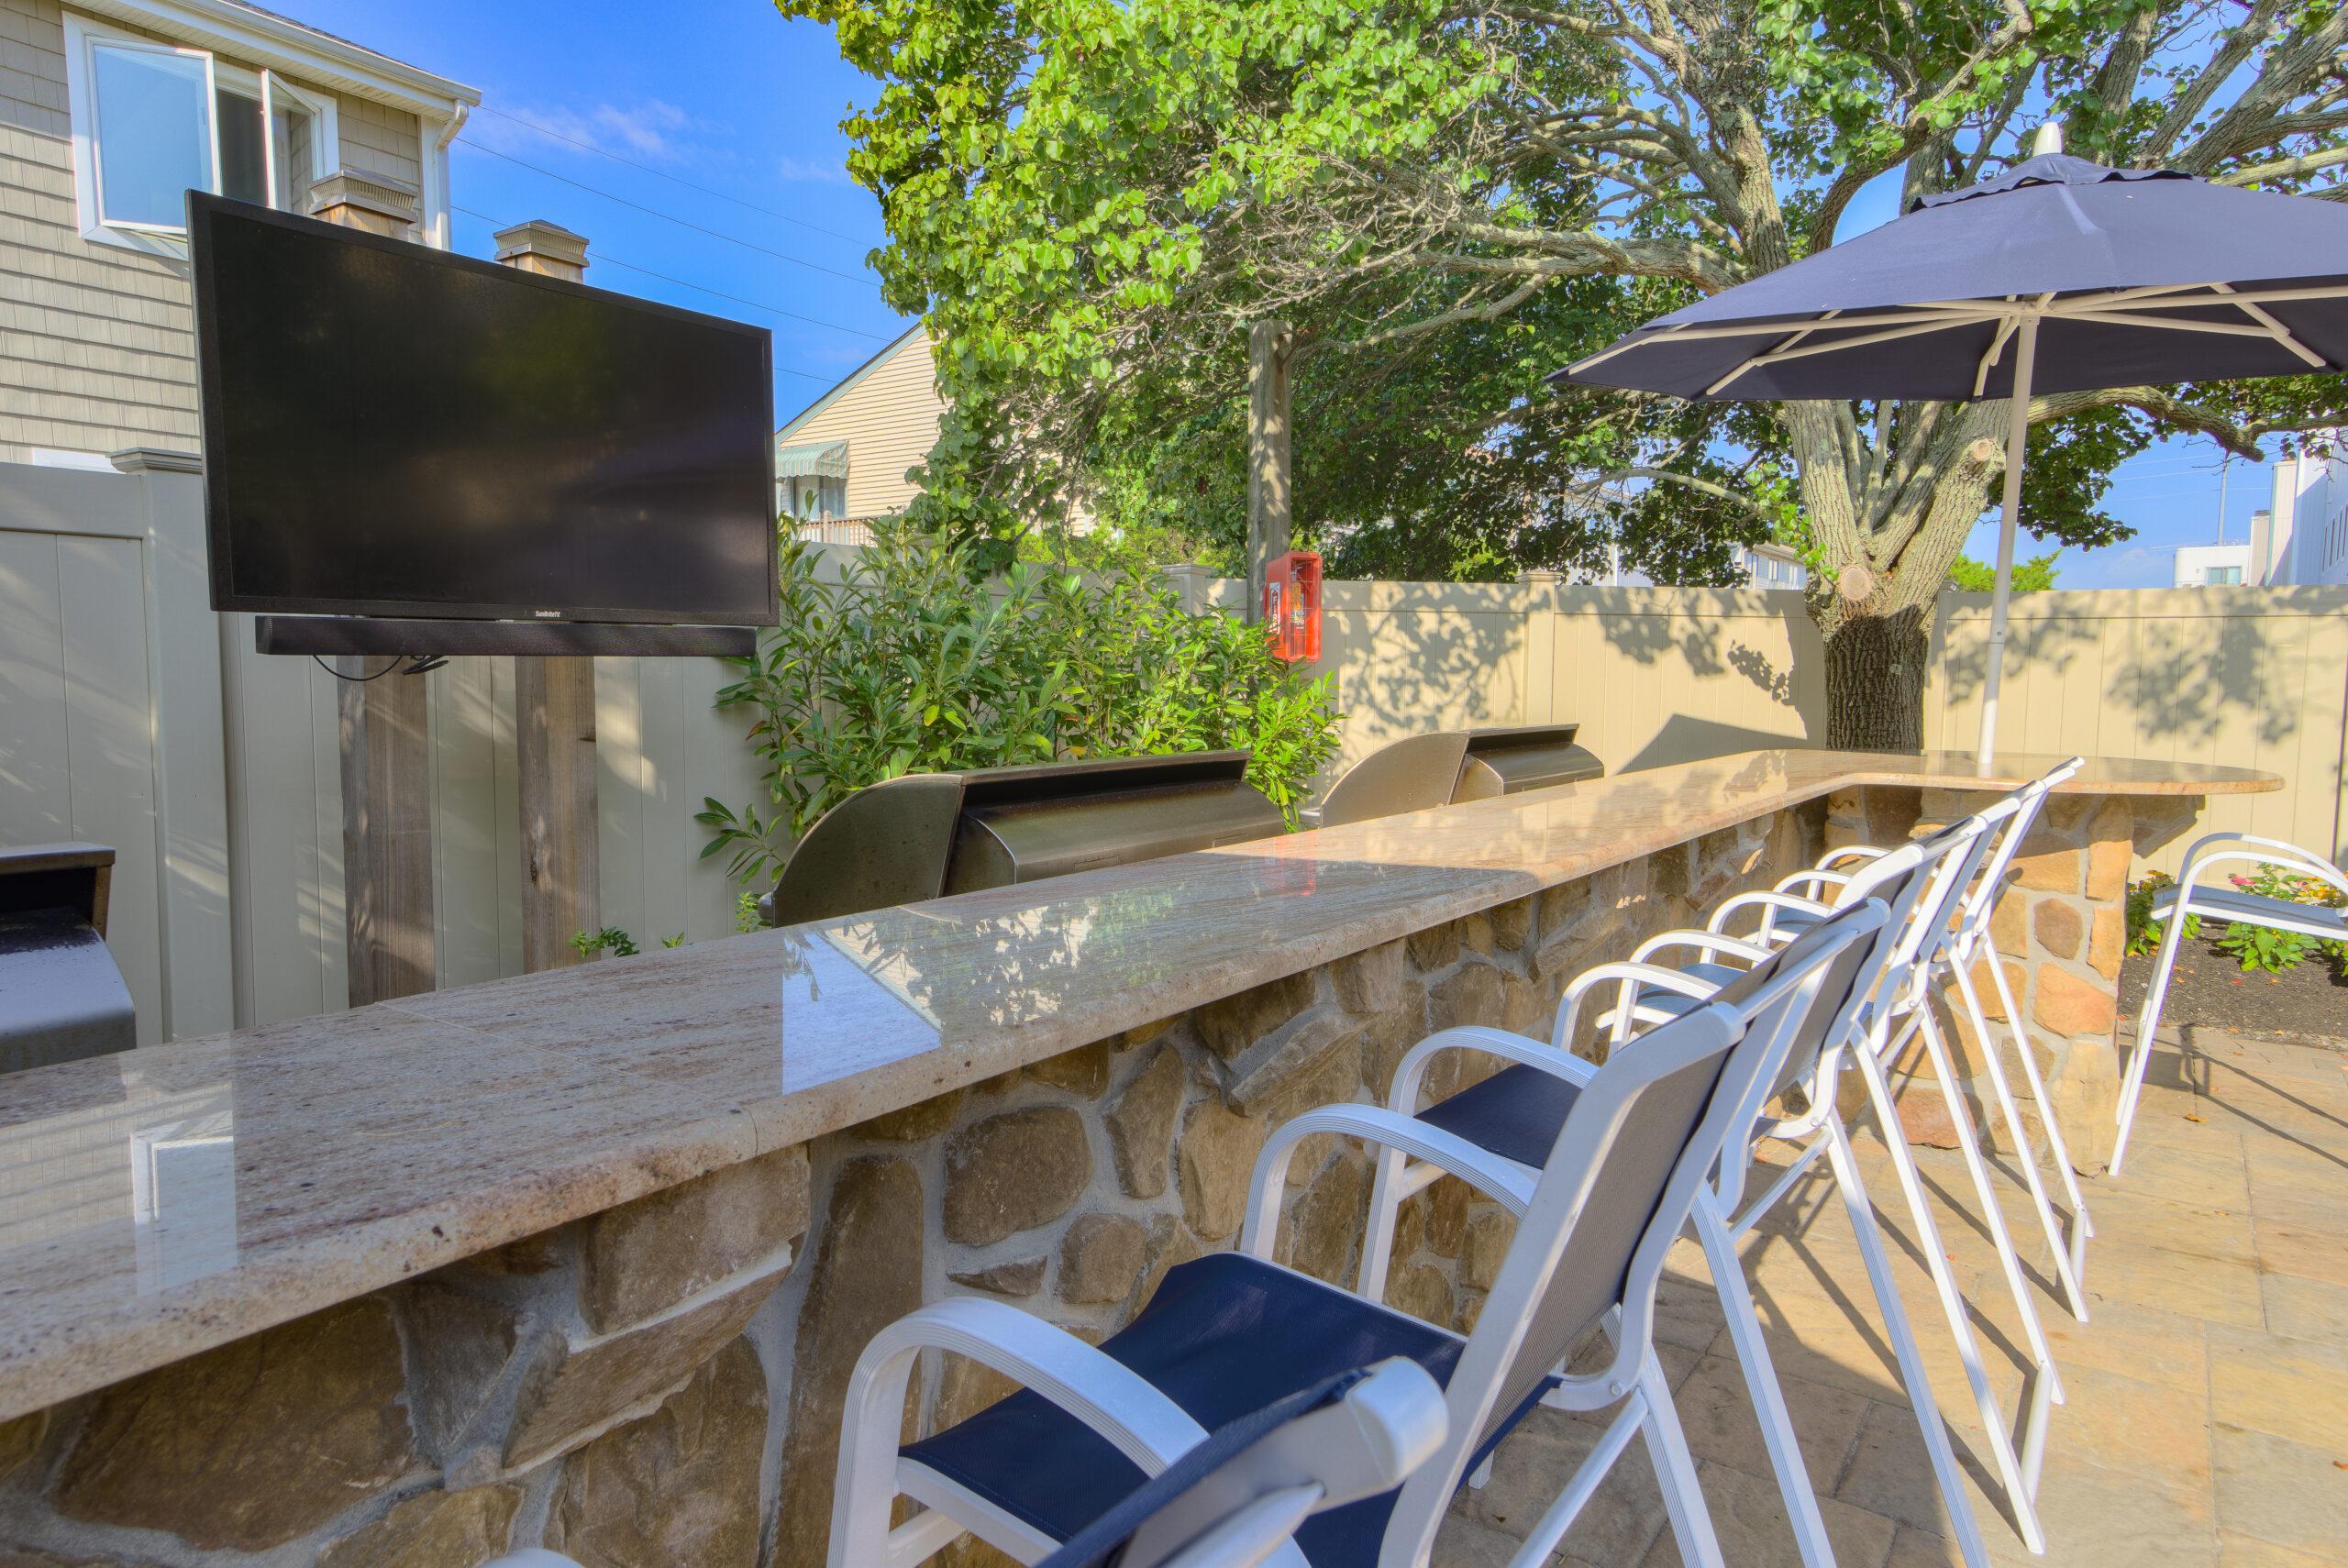 Outdoor Living DiPalentino Contractors